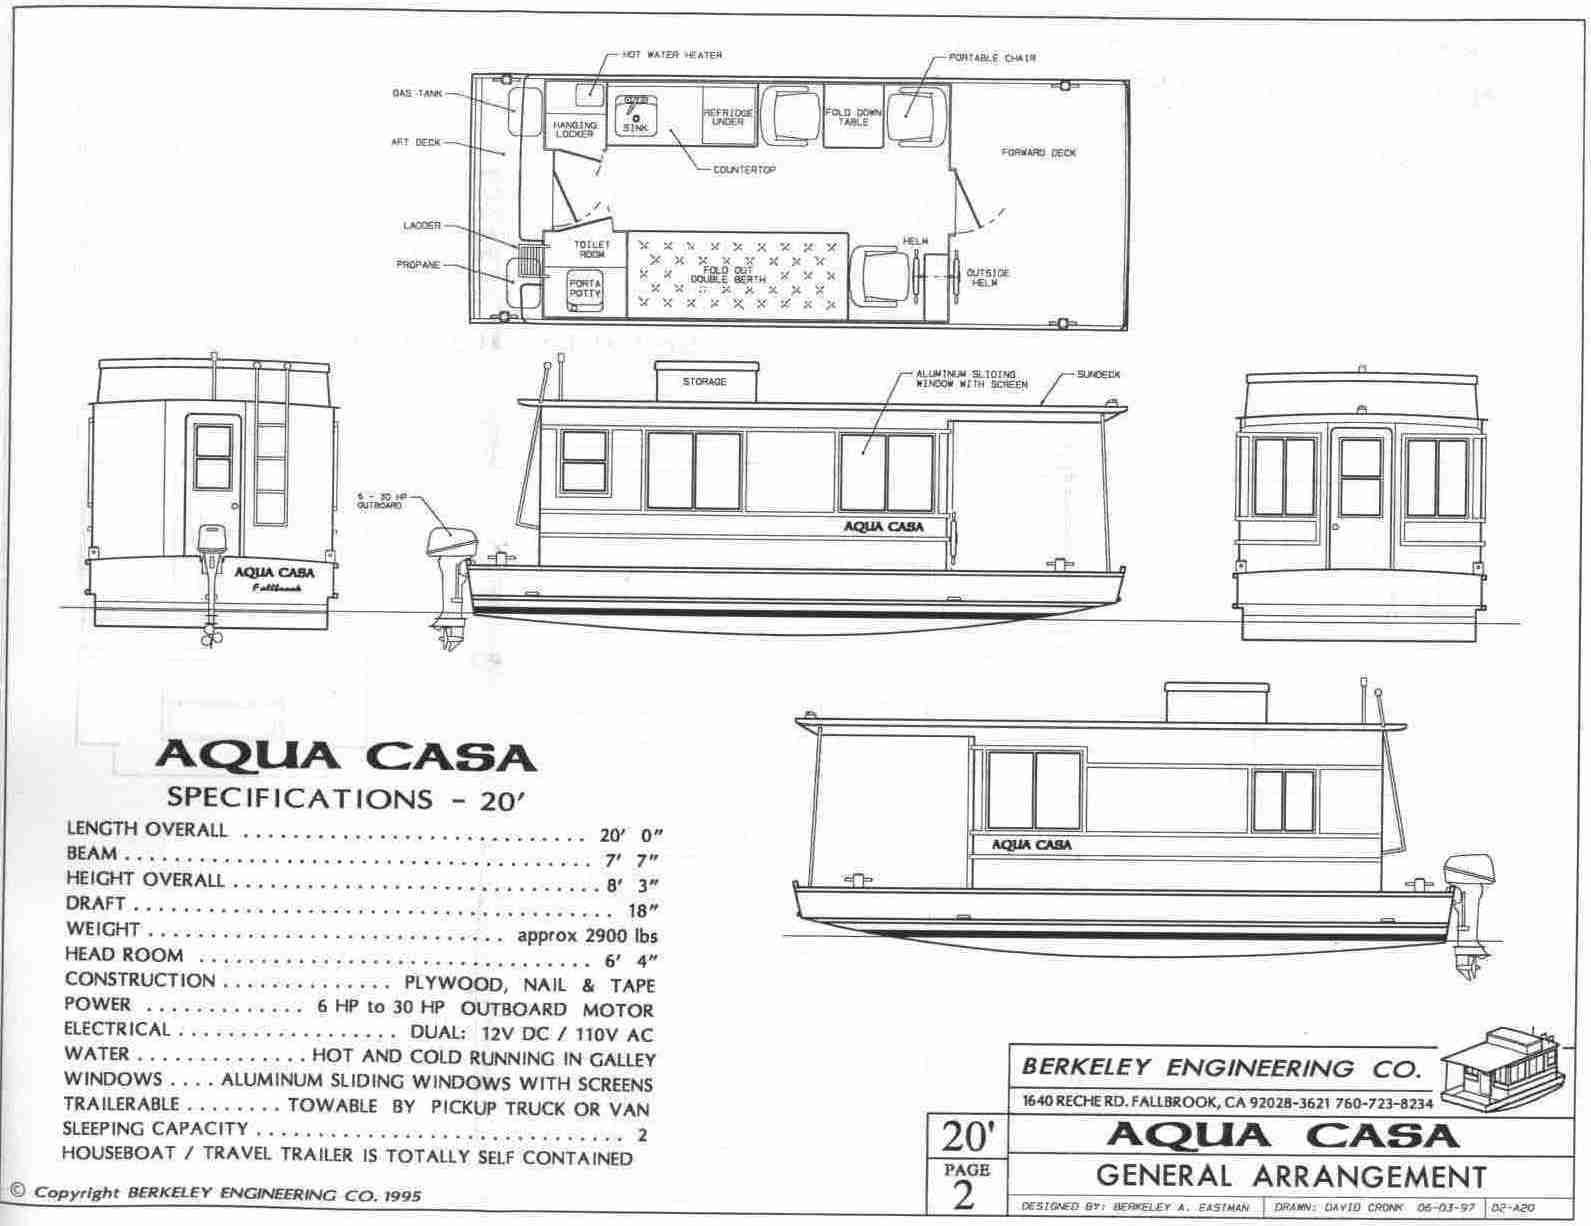 Aqua Casa Houseboat House Boat Shanty Boat Wooden Boat Plans